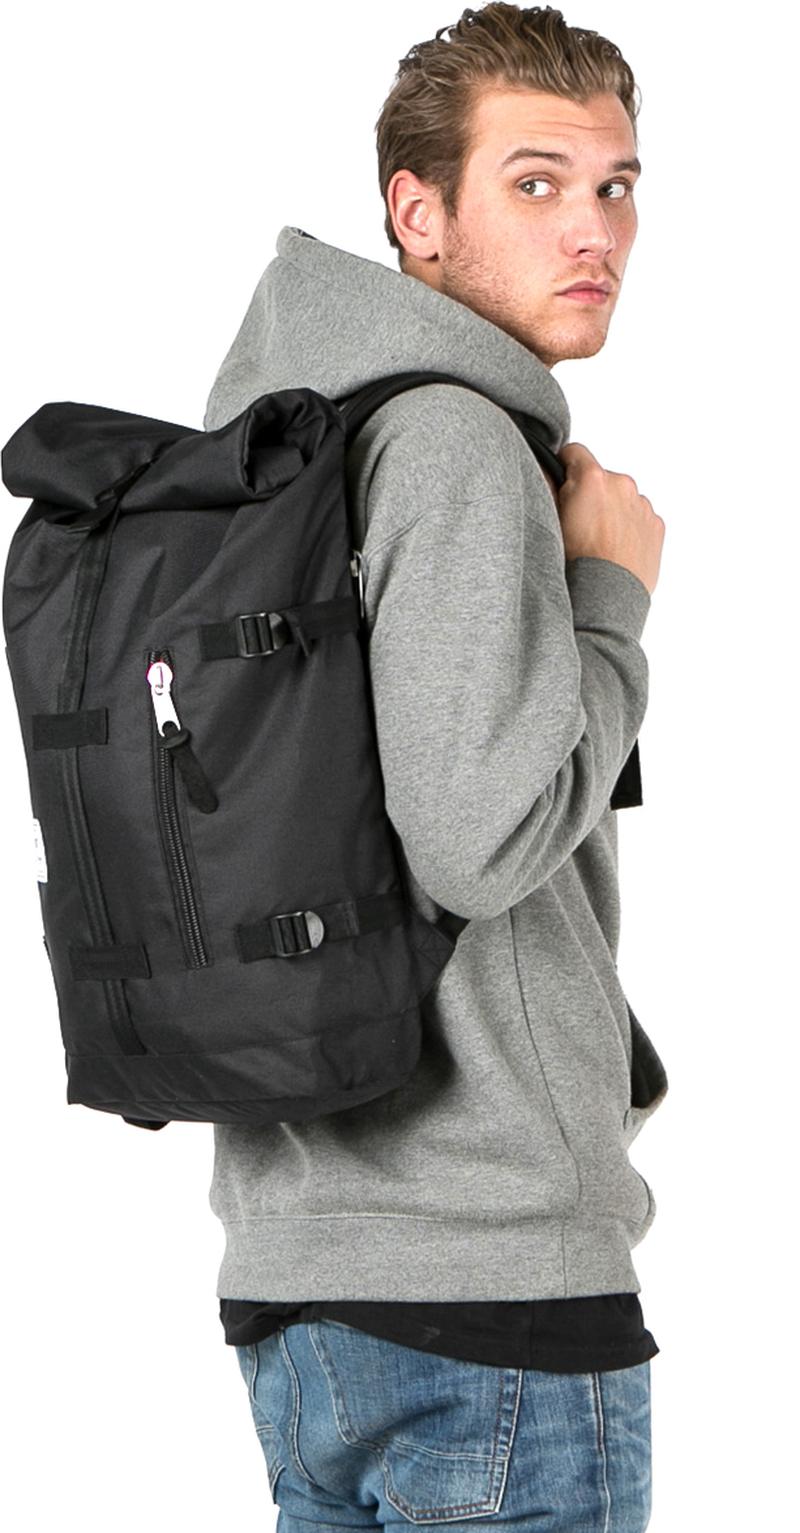 Barts Mountain Backpack photo 5